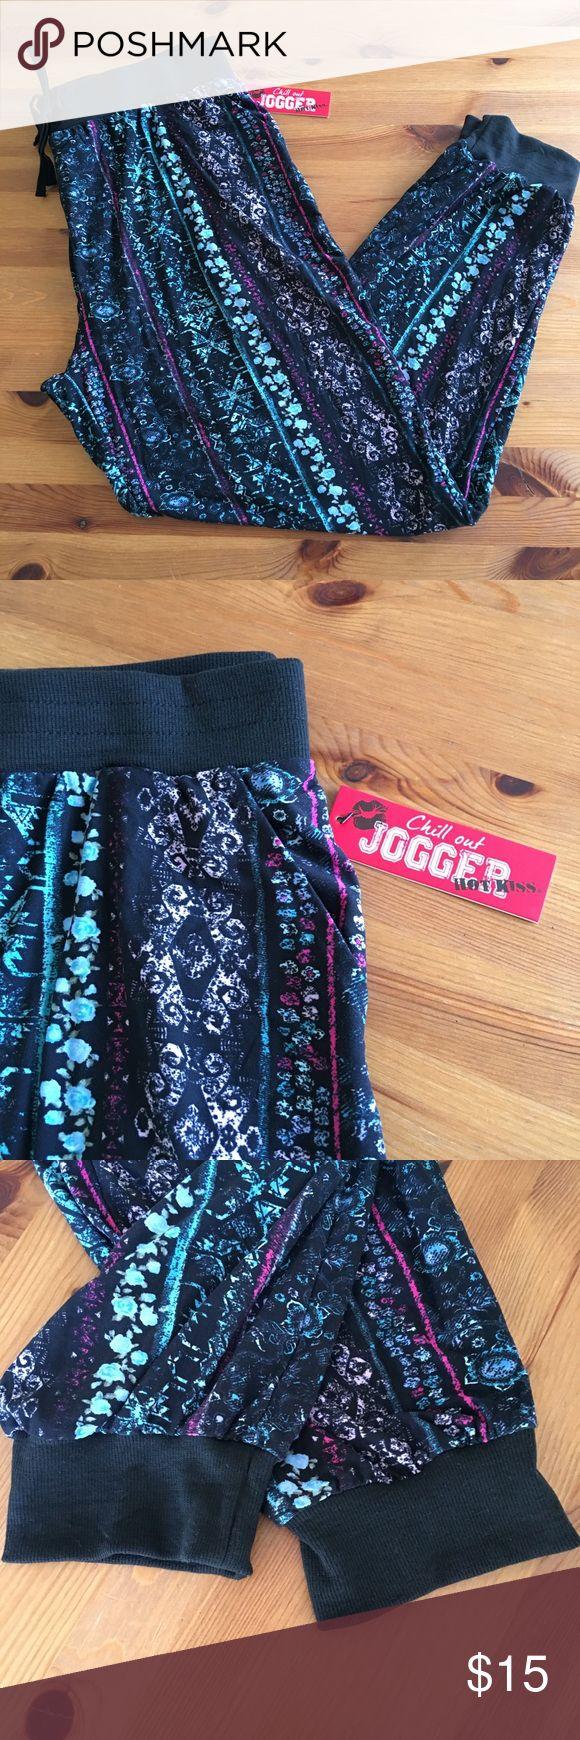 Hot Kiss Jogger Soft Pant Juniors' drawstring Waist jogger pants. Lightweight and so soft! Hot Kiss Pants Track Pants & Joggers